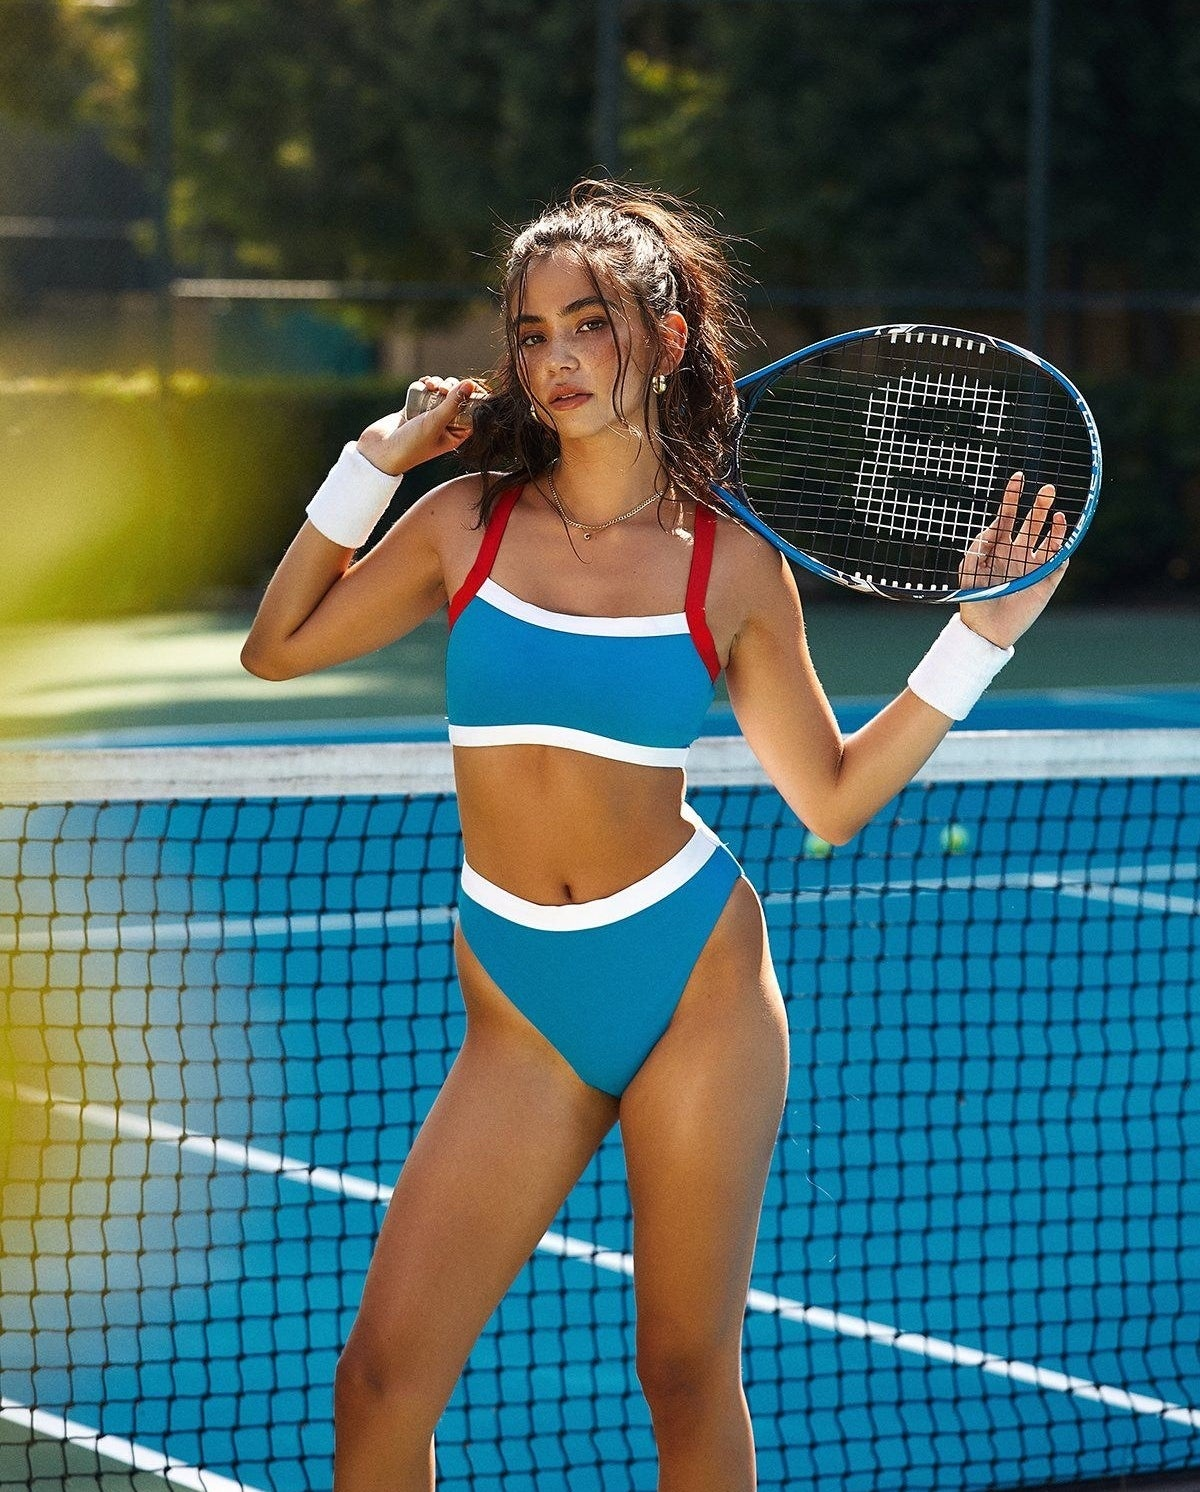 model wearing sporty swimsuit on a tennis court